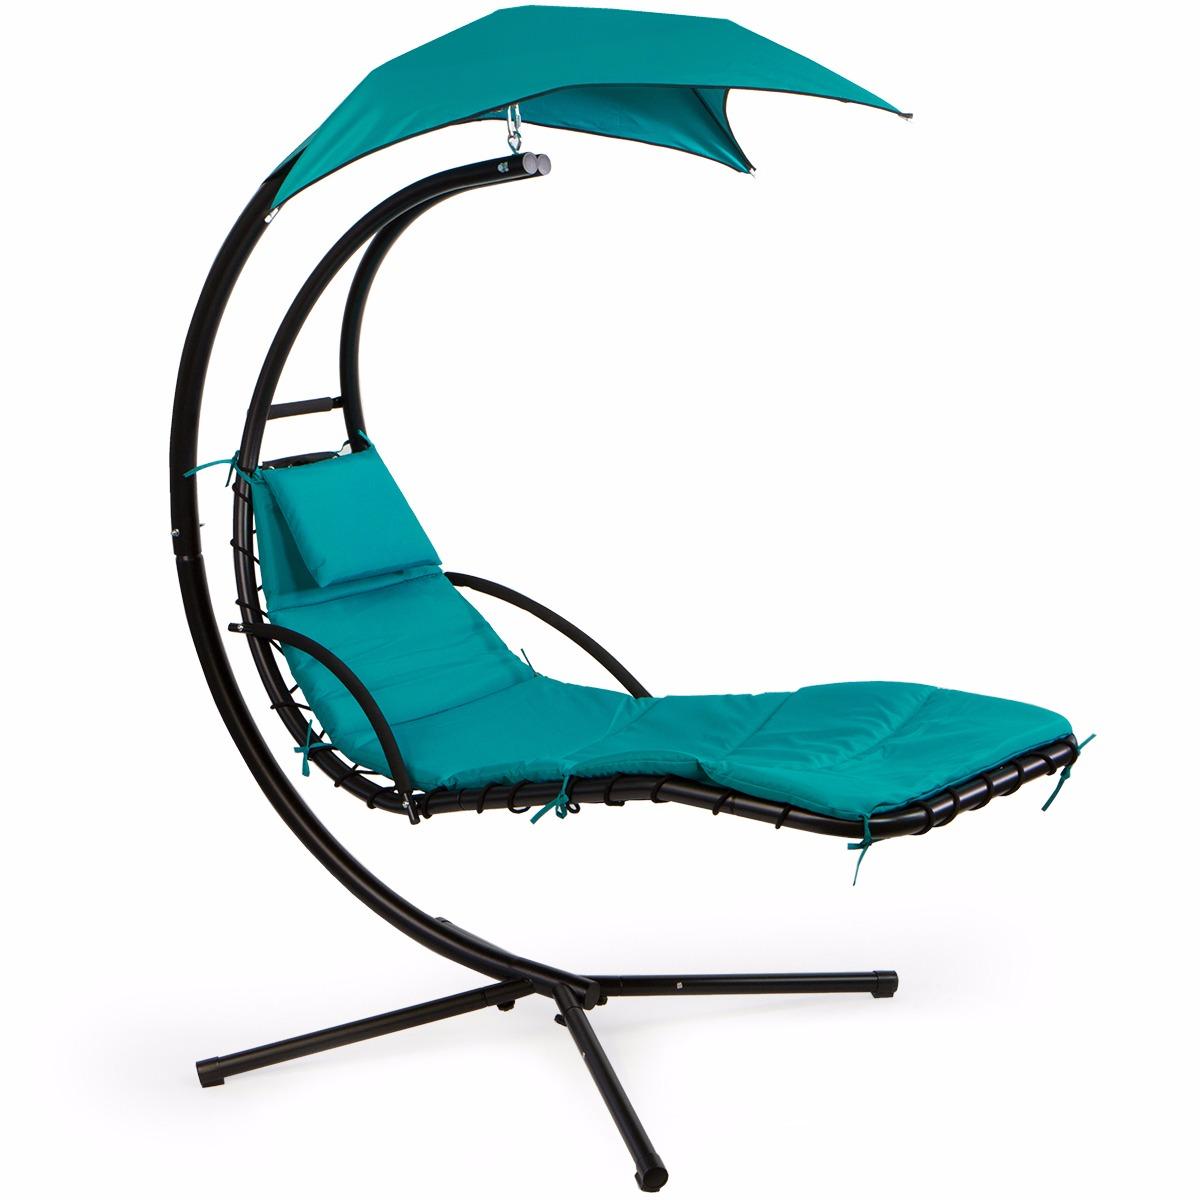 patio swing chair lounger hammock sun canopy, blue - walmart